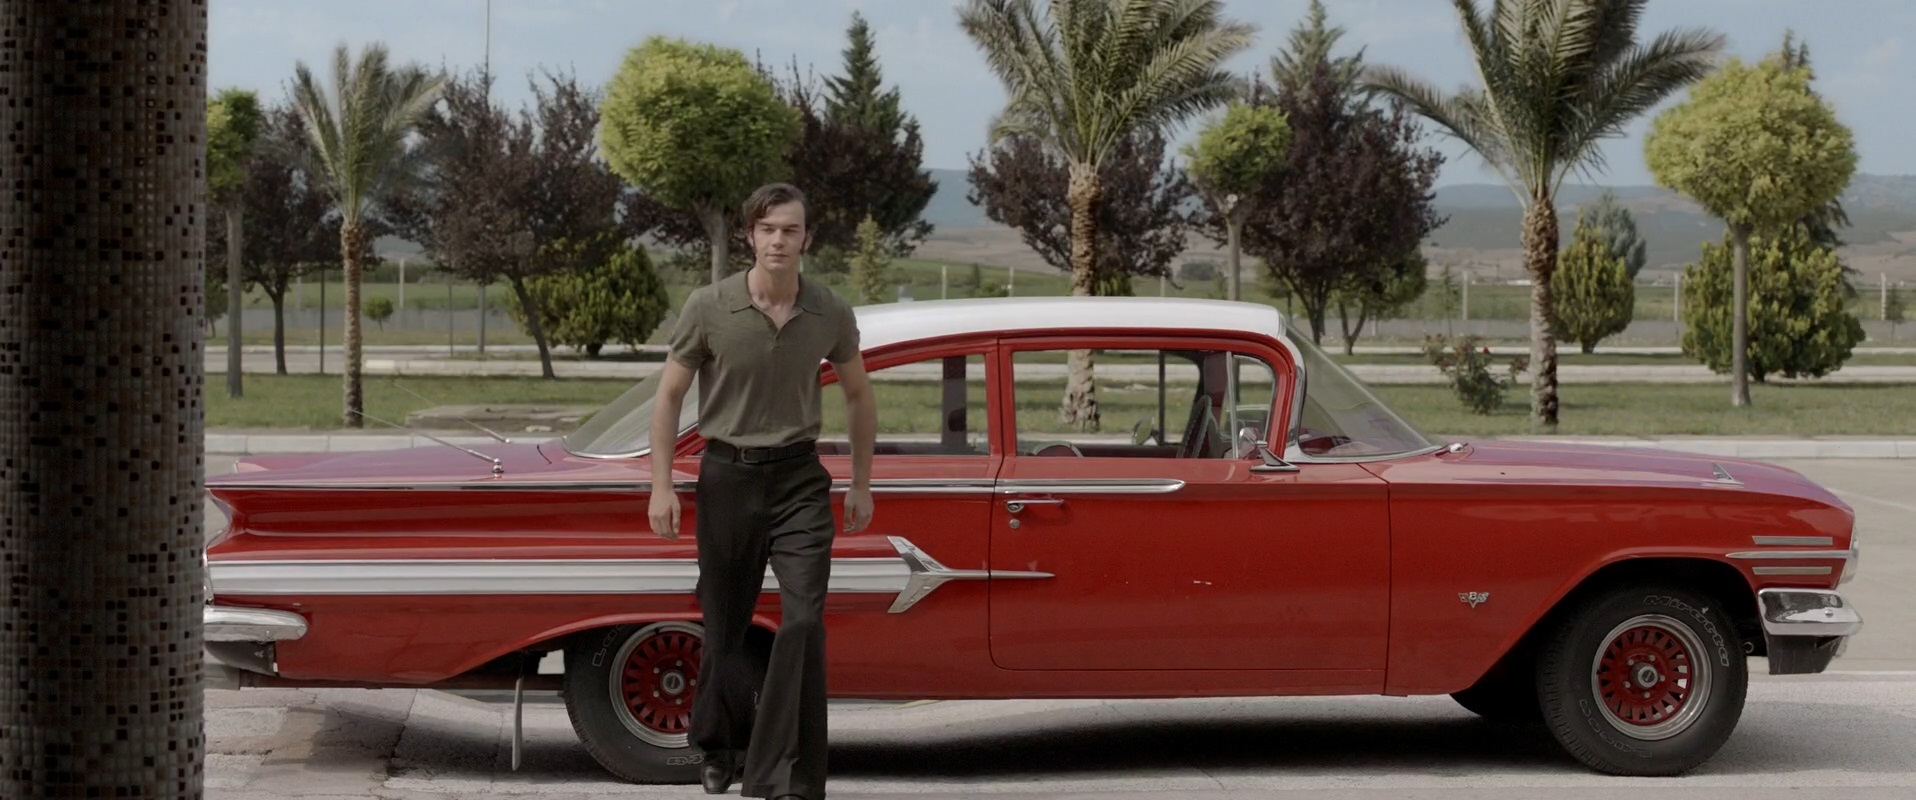 Aşk Tesadüfleri Sever 2 | 2020 | Yerli Film | WEB-DL | XviD | Sansürsüz | 720p - 1080p - m720p - m1080p | WEB-DL | Tek Link